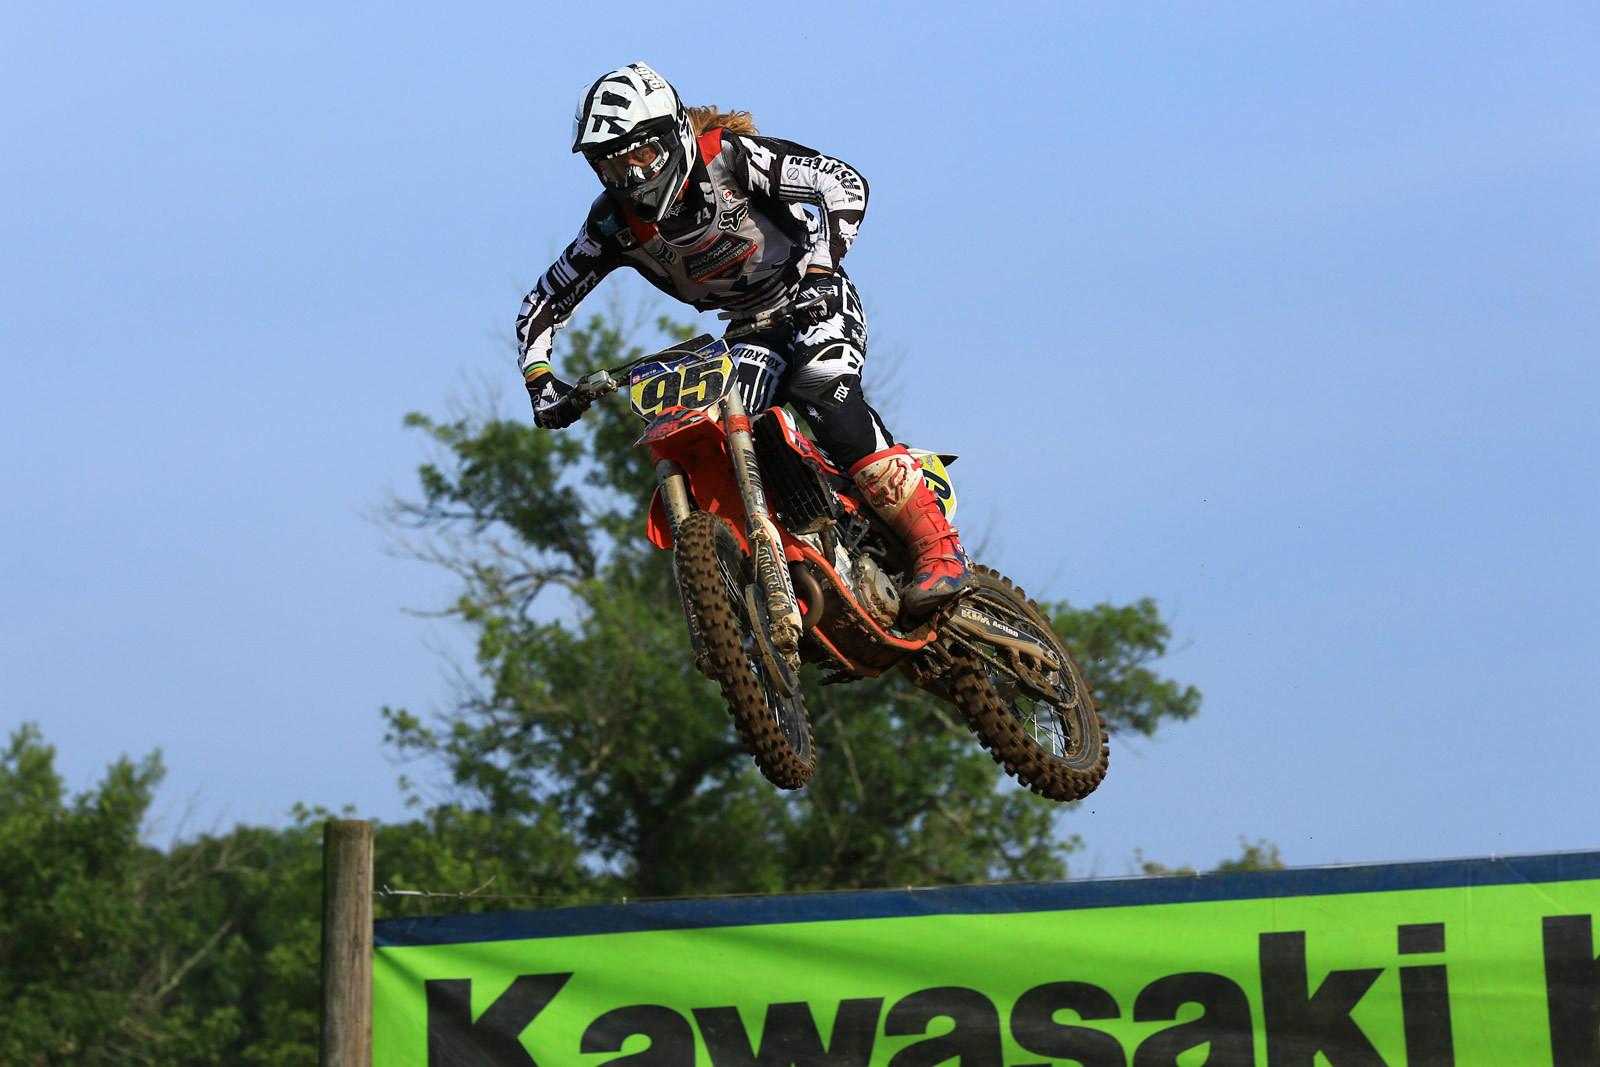 Masterpool - Day 1: 2015 Rocky Mountain ATV/MC AMA Amateur National Motocross Championships  - Motocross Pictures - Vital MX